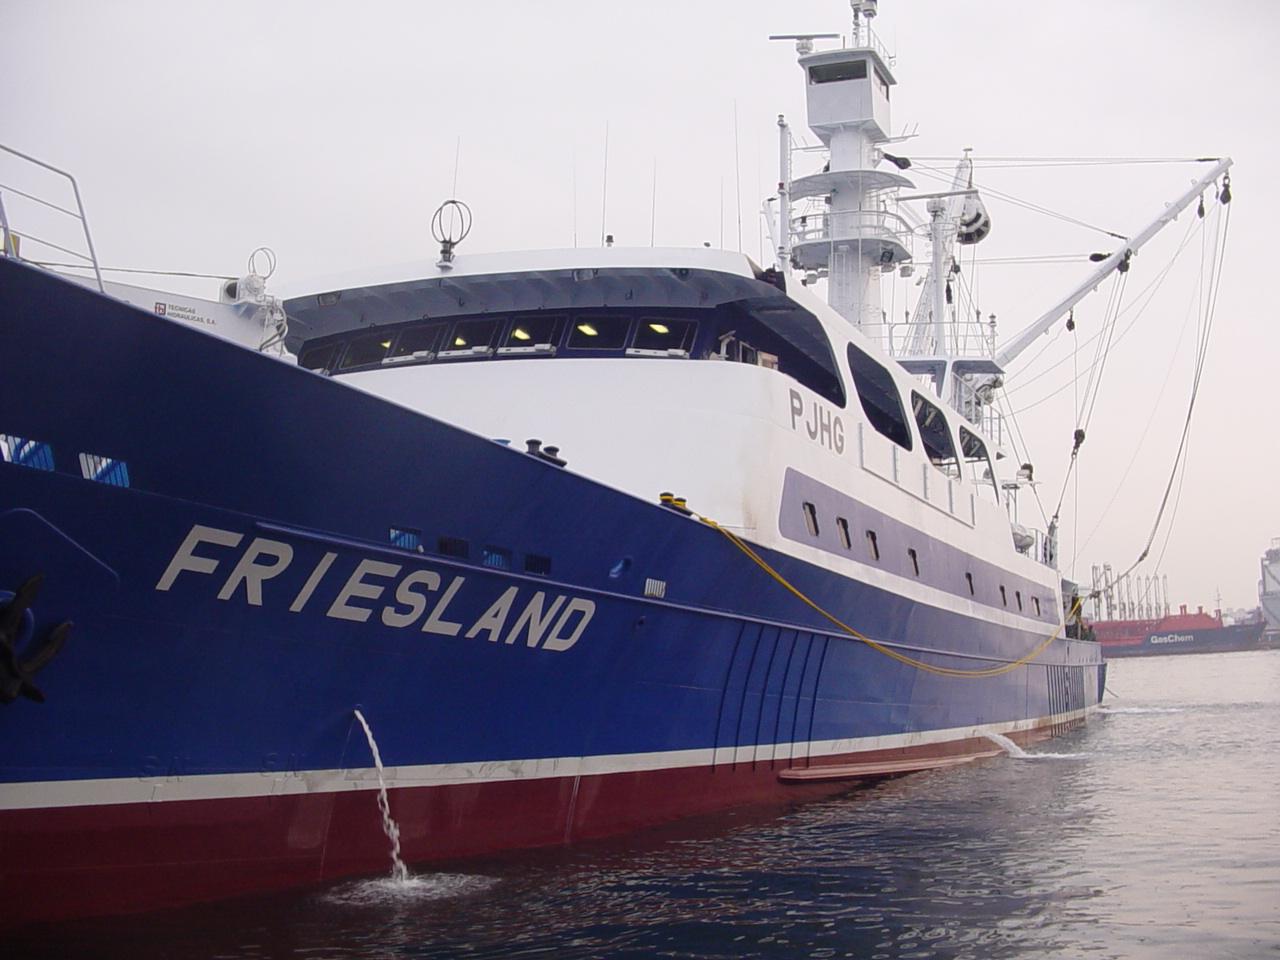 Primer atunero equipado por TH Marco en Asia (Friesland)